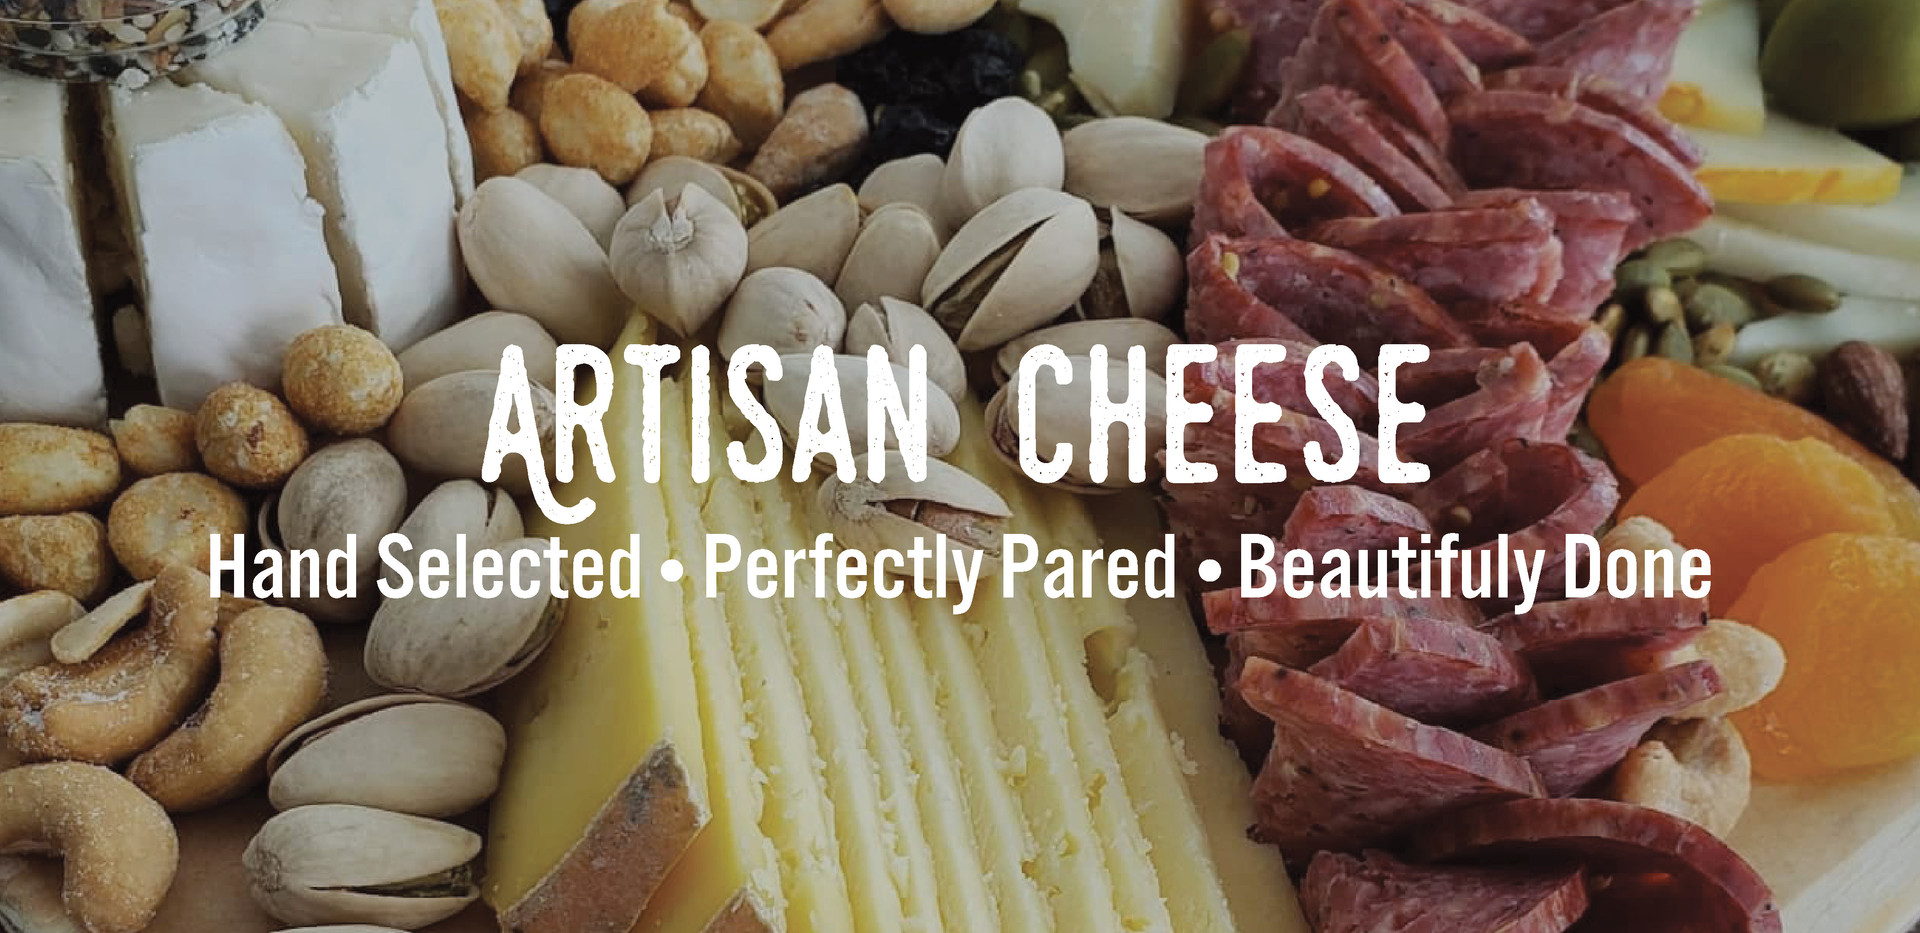 Artisan Cheese.jpg